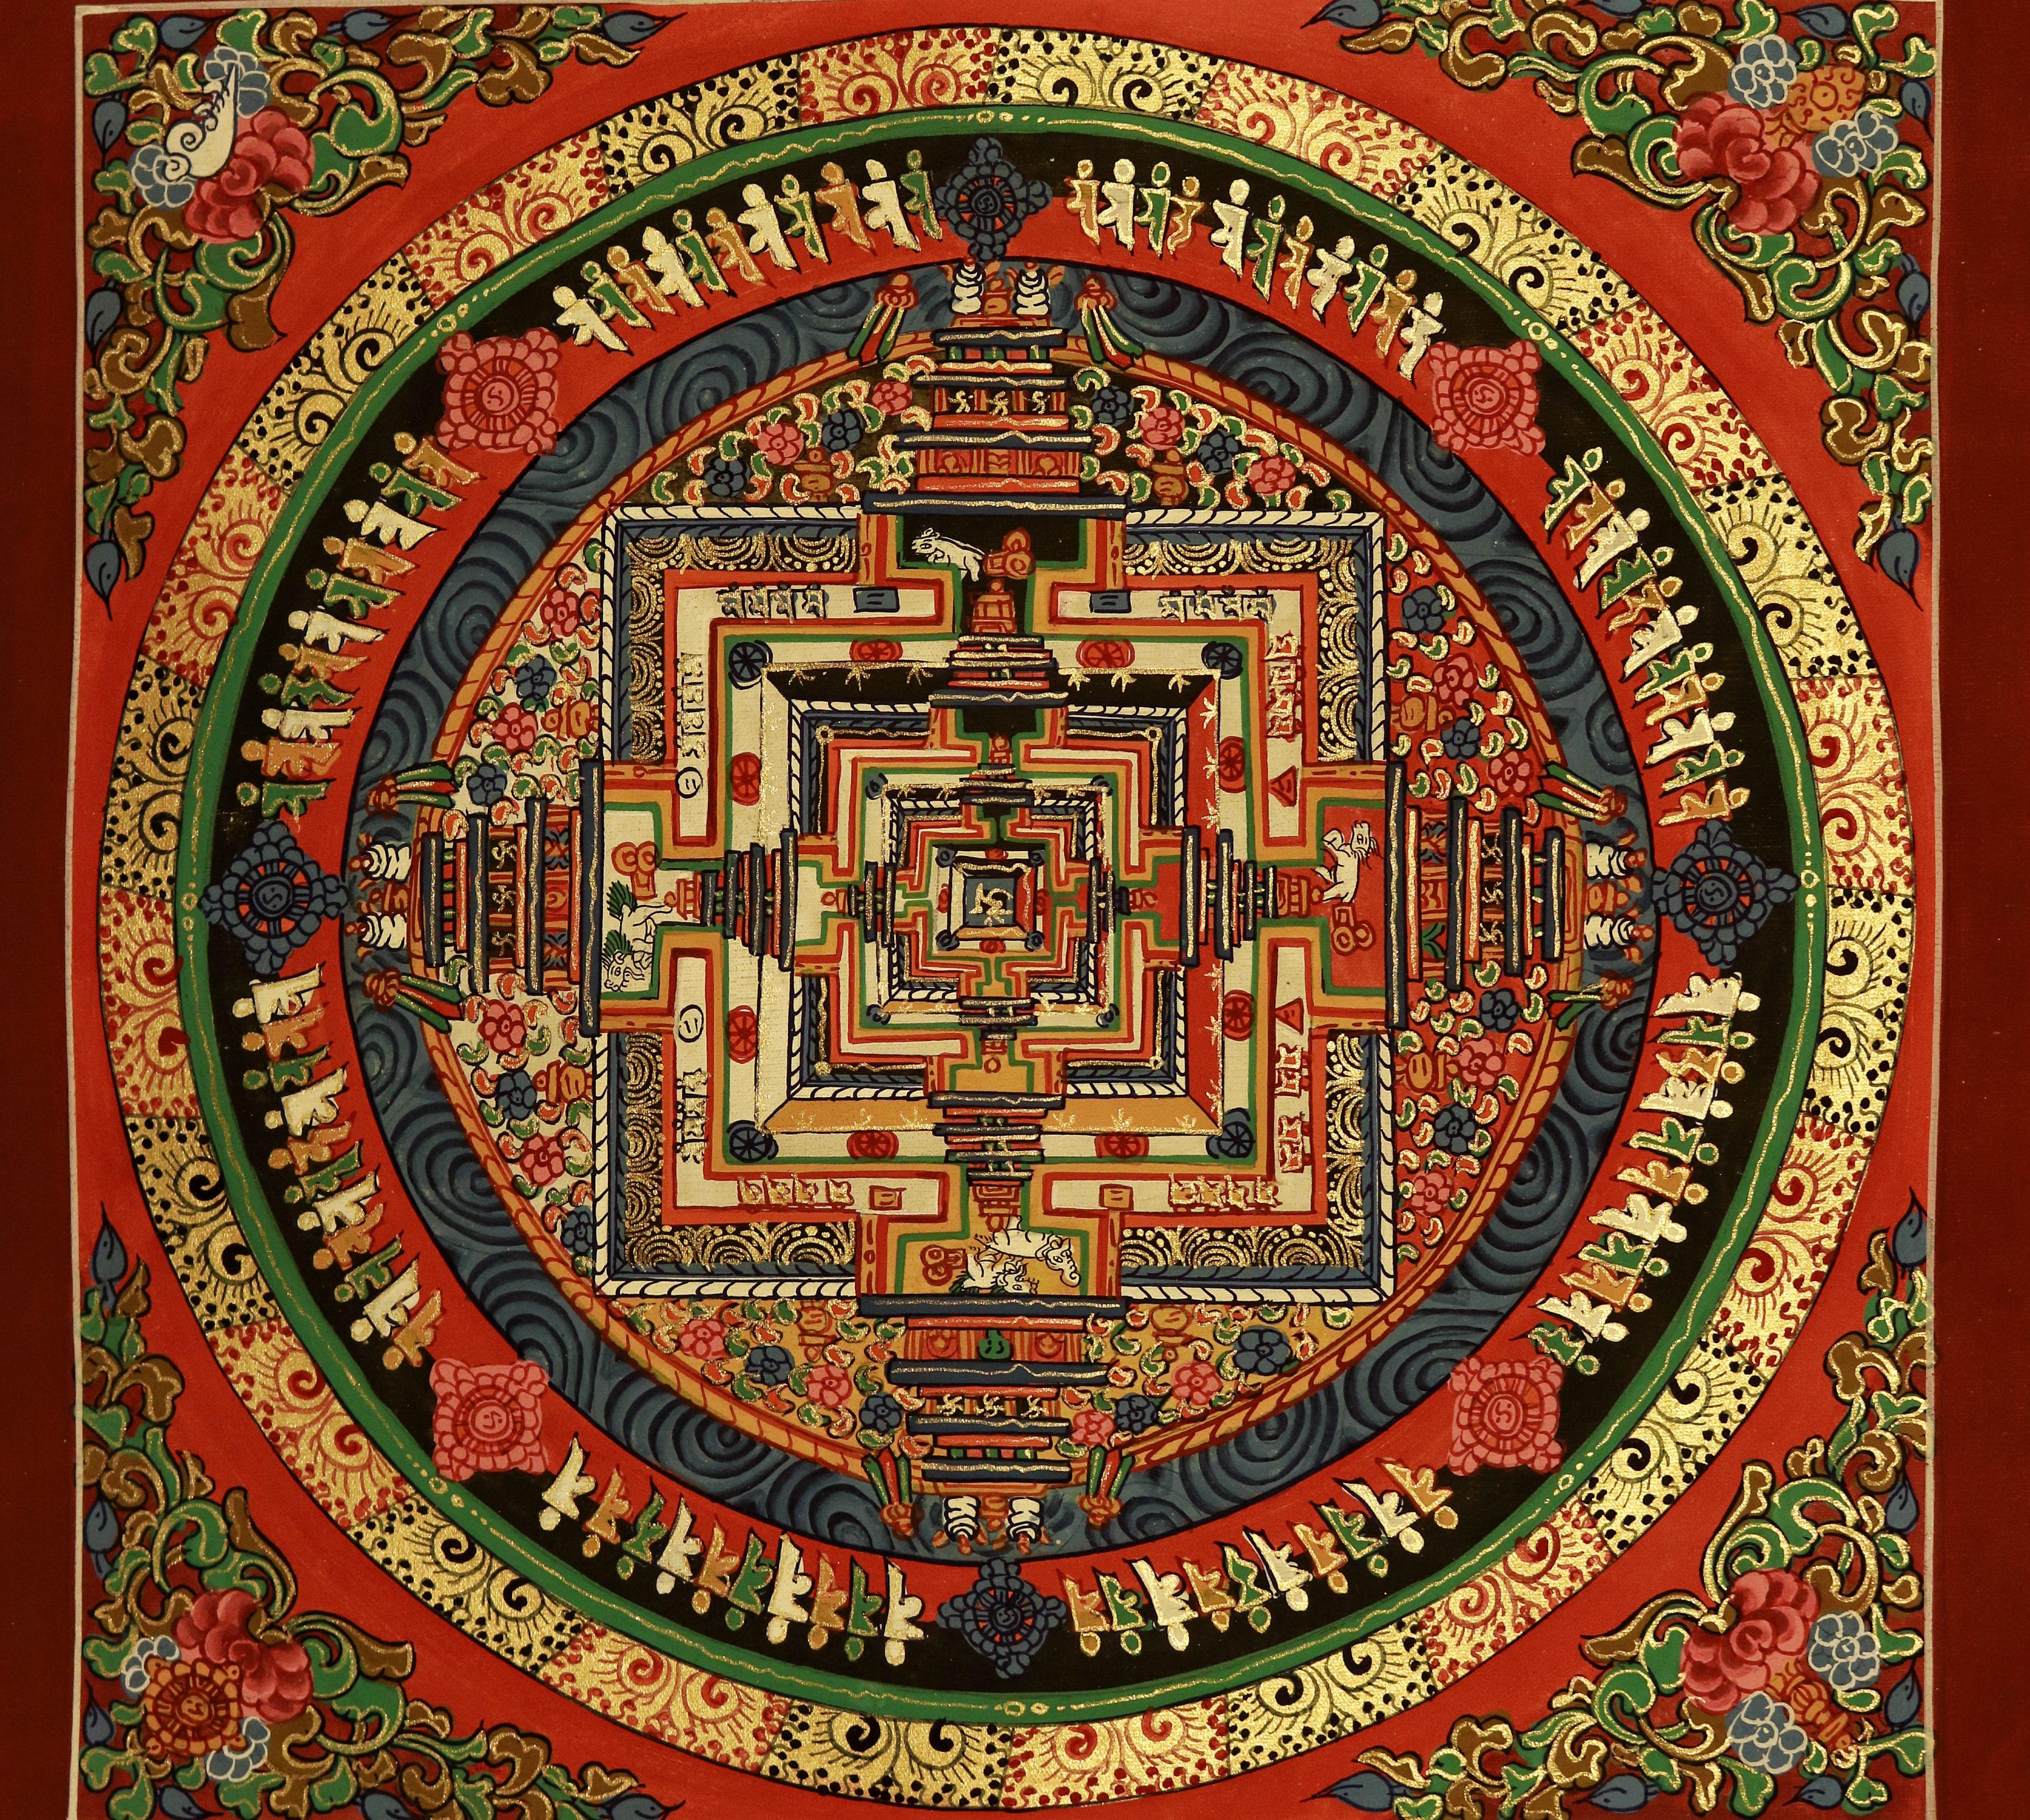 Mandalas buddhism definition of sexual misconduct